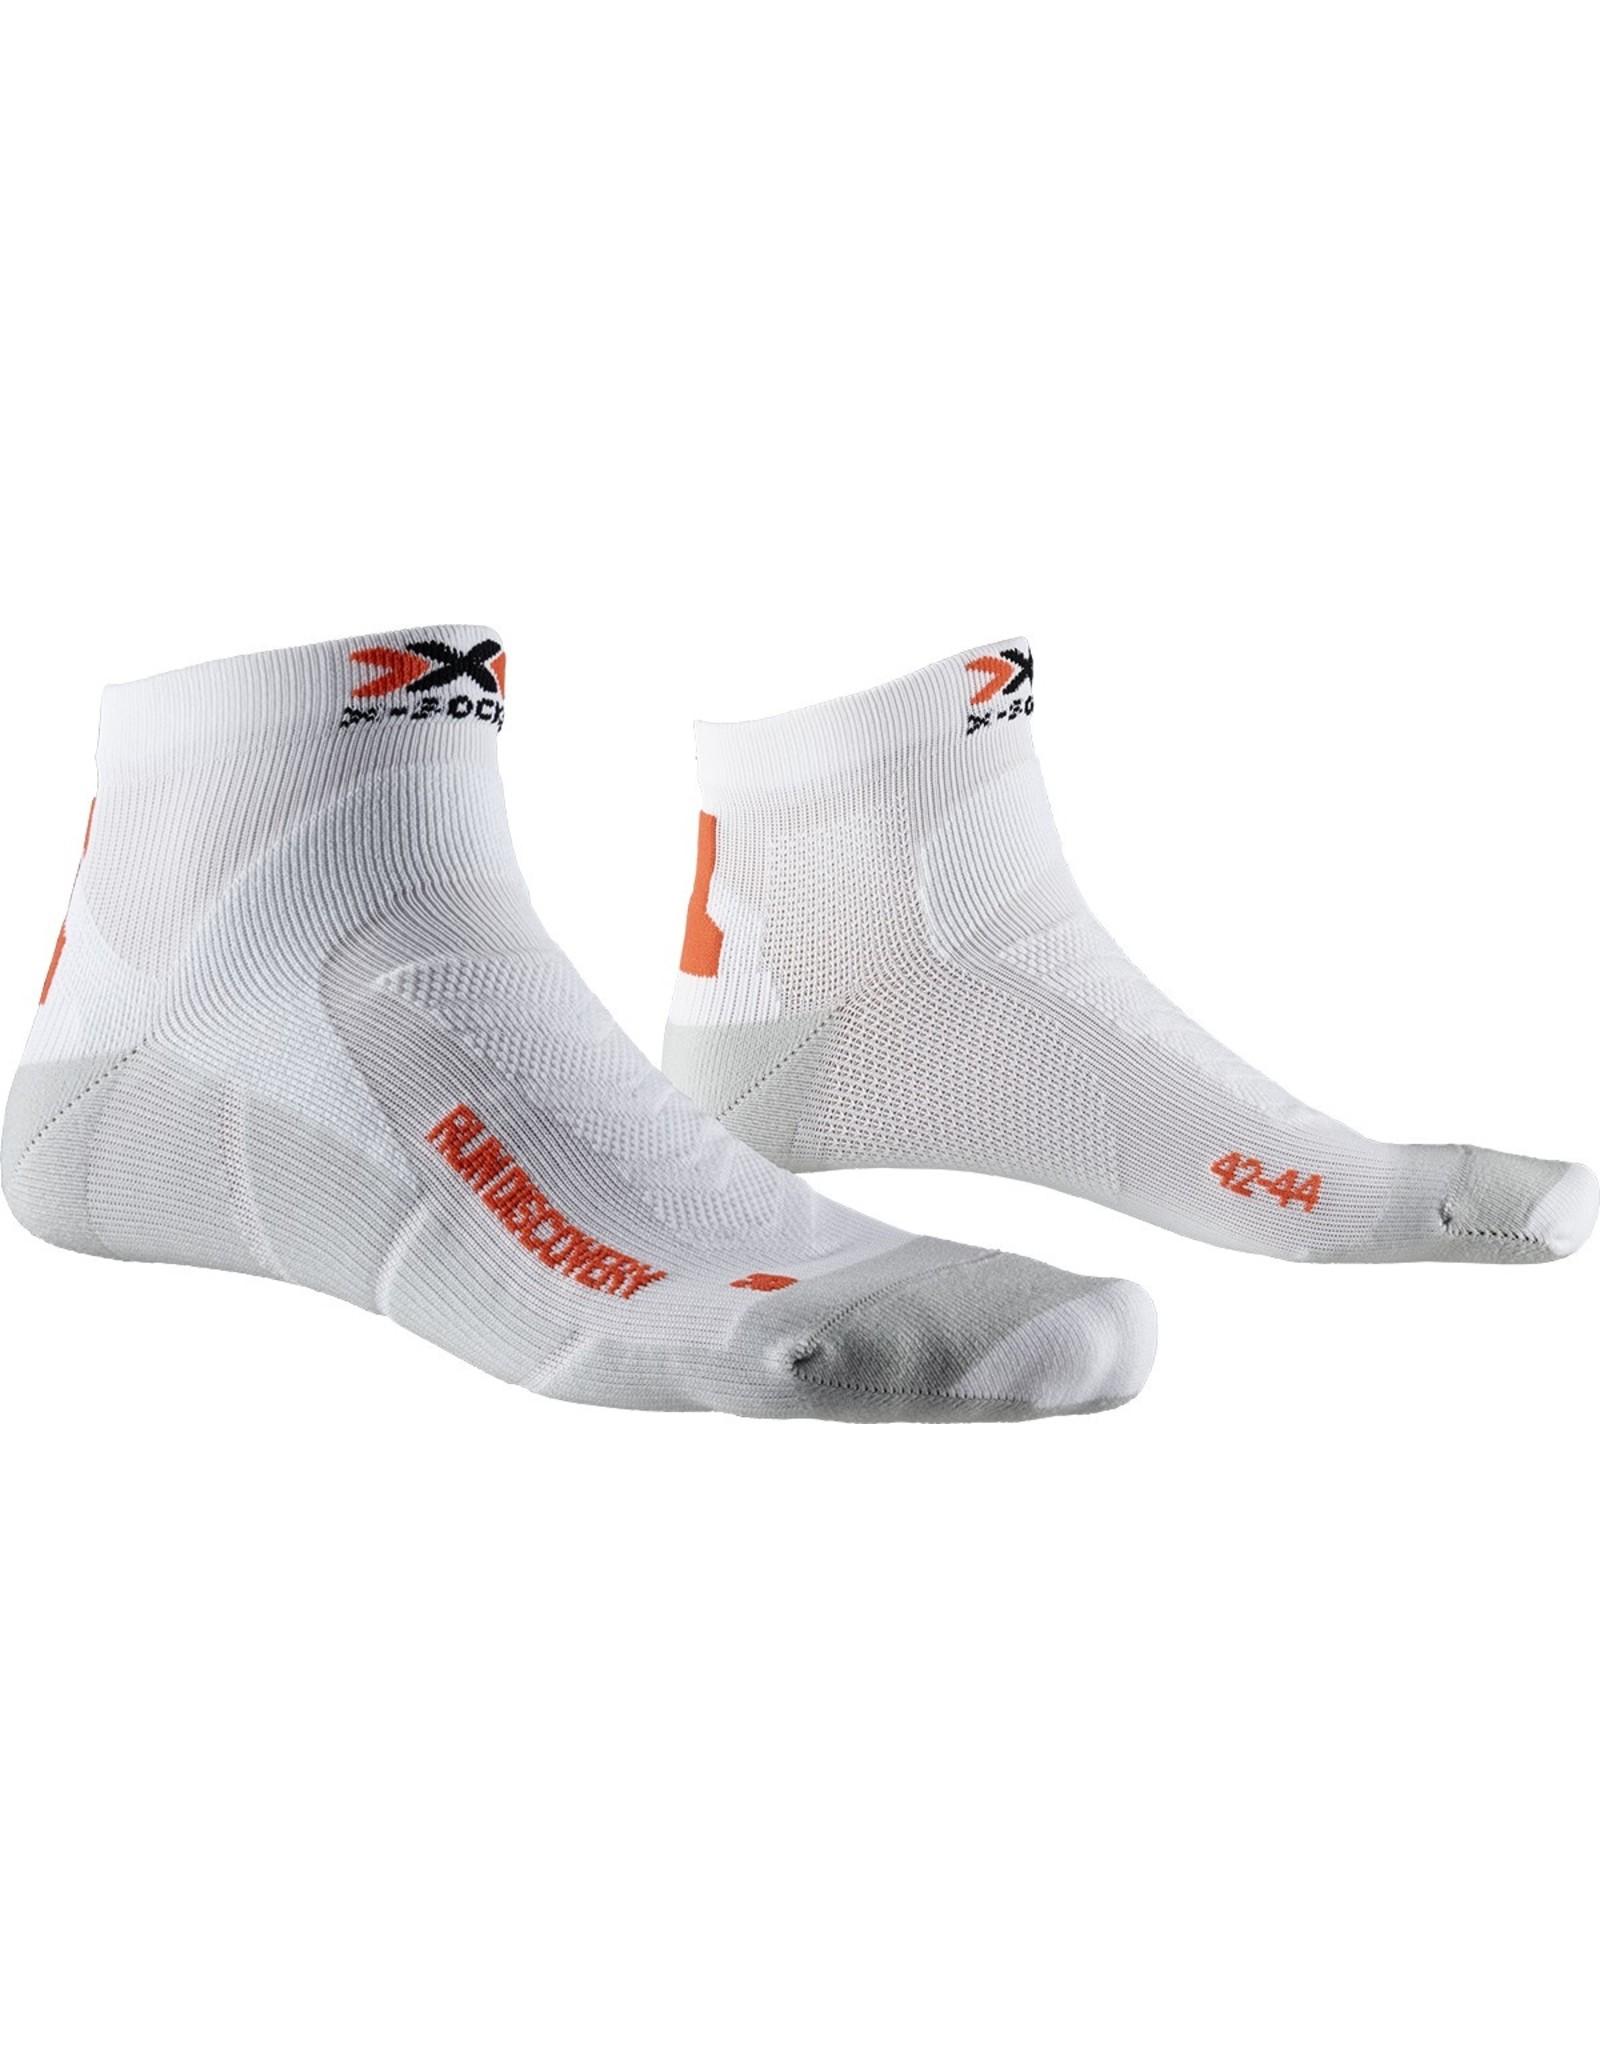 X-socks Run Discovery Socks-white/grey